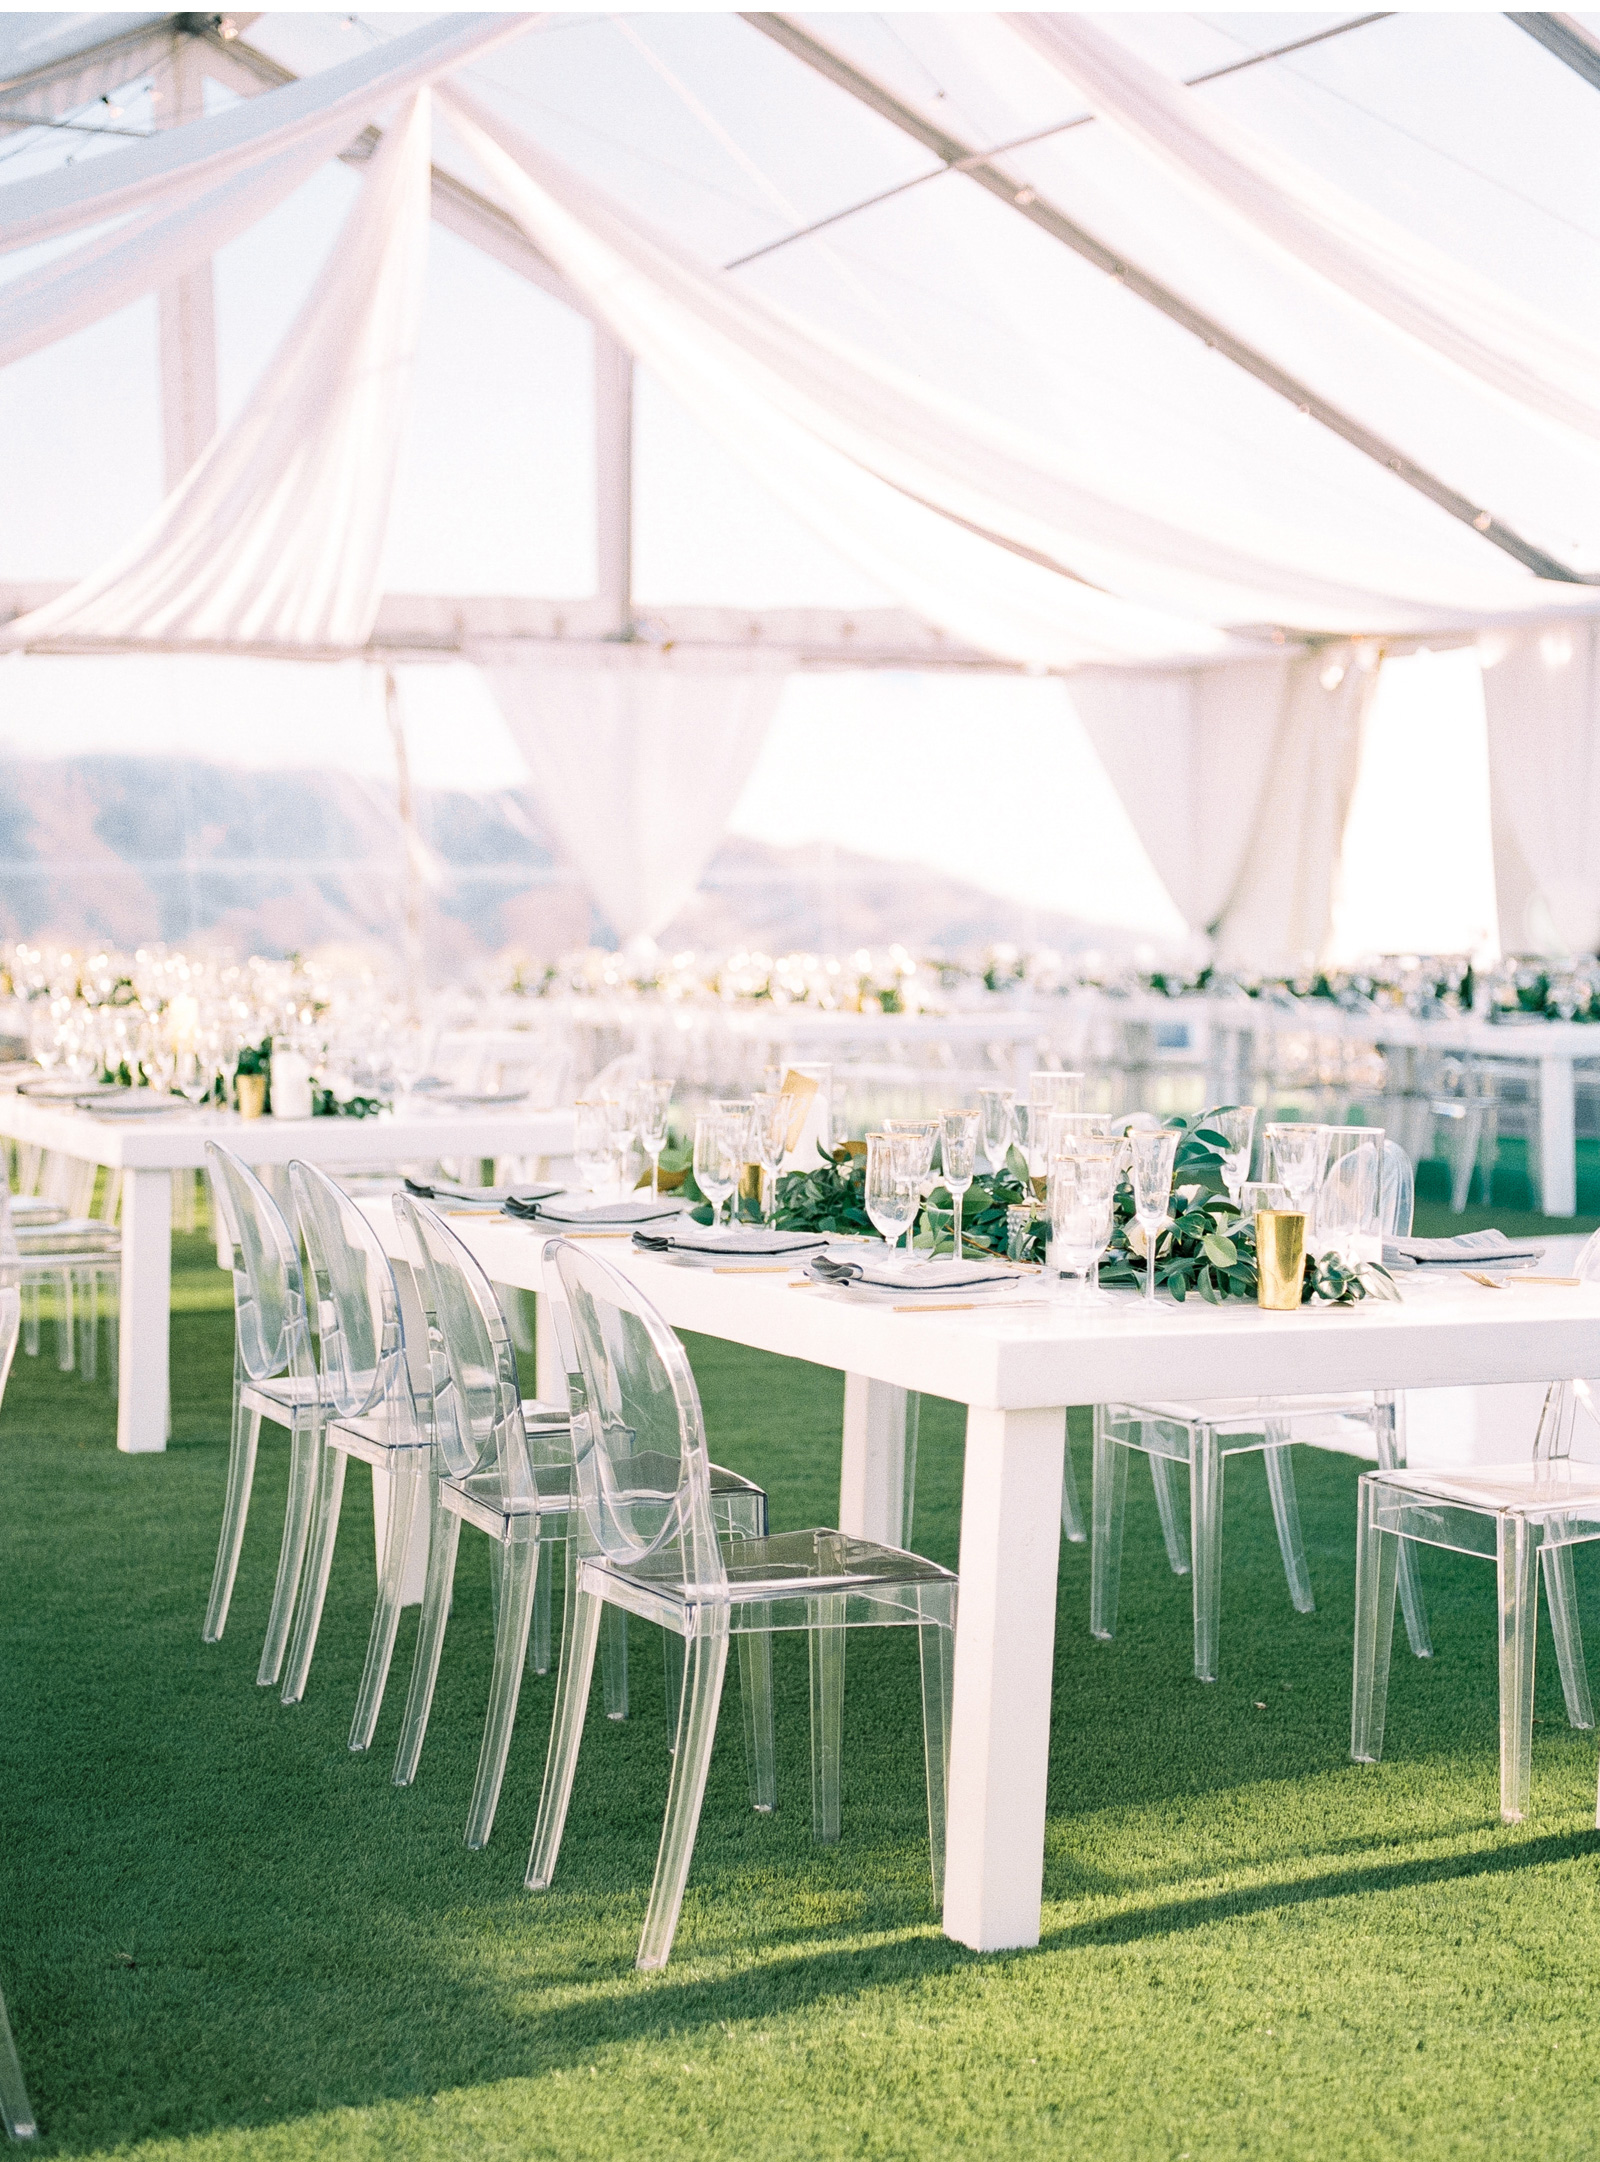 Malibu-Rocky-Oaks-Wedding-Style-Me-Pretty-Southern-California-Wedding-Venues-Fine-Art-Wedding-Photogrpaher-Natalie-Schutt-Photography_01.jpg